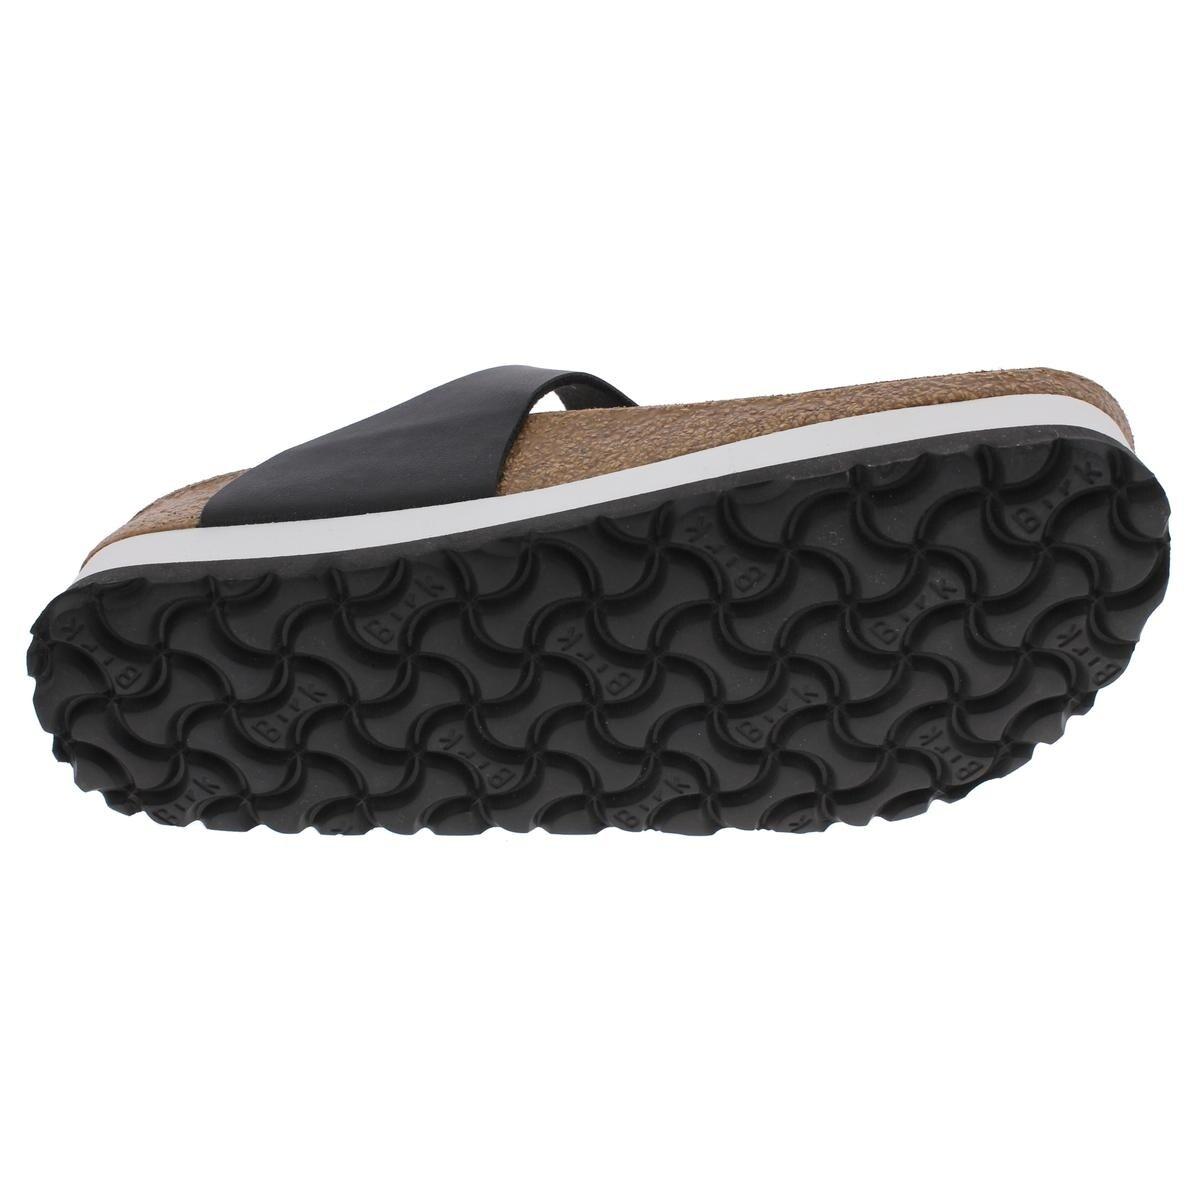 f0e10cf4650 Shop Papillio by Birkenstock Womens Gizeh Platform Sandals Casual Cork - 6  medium (b